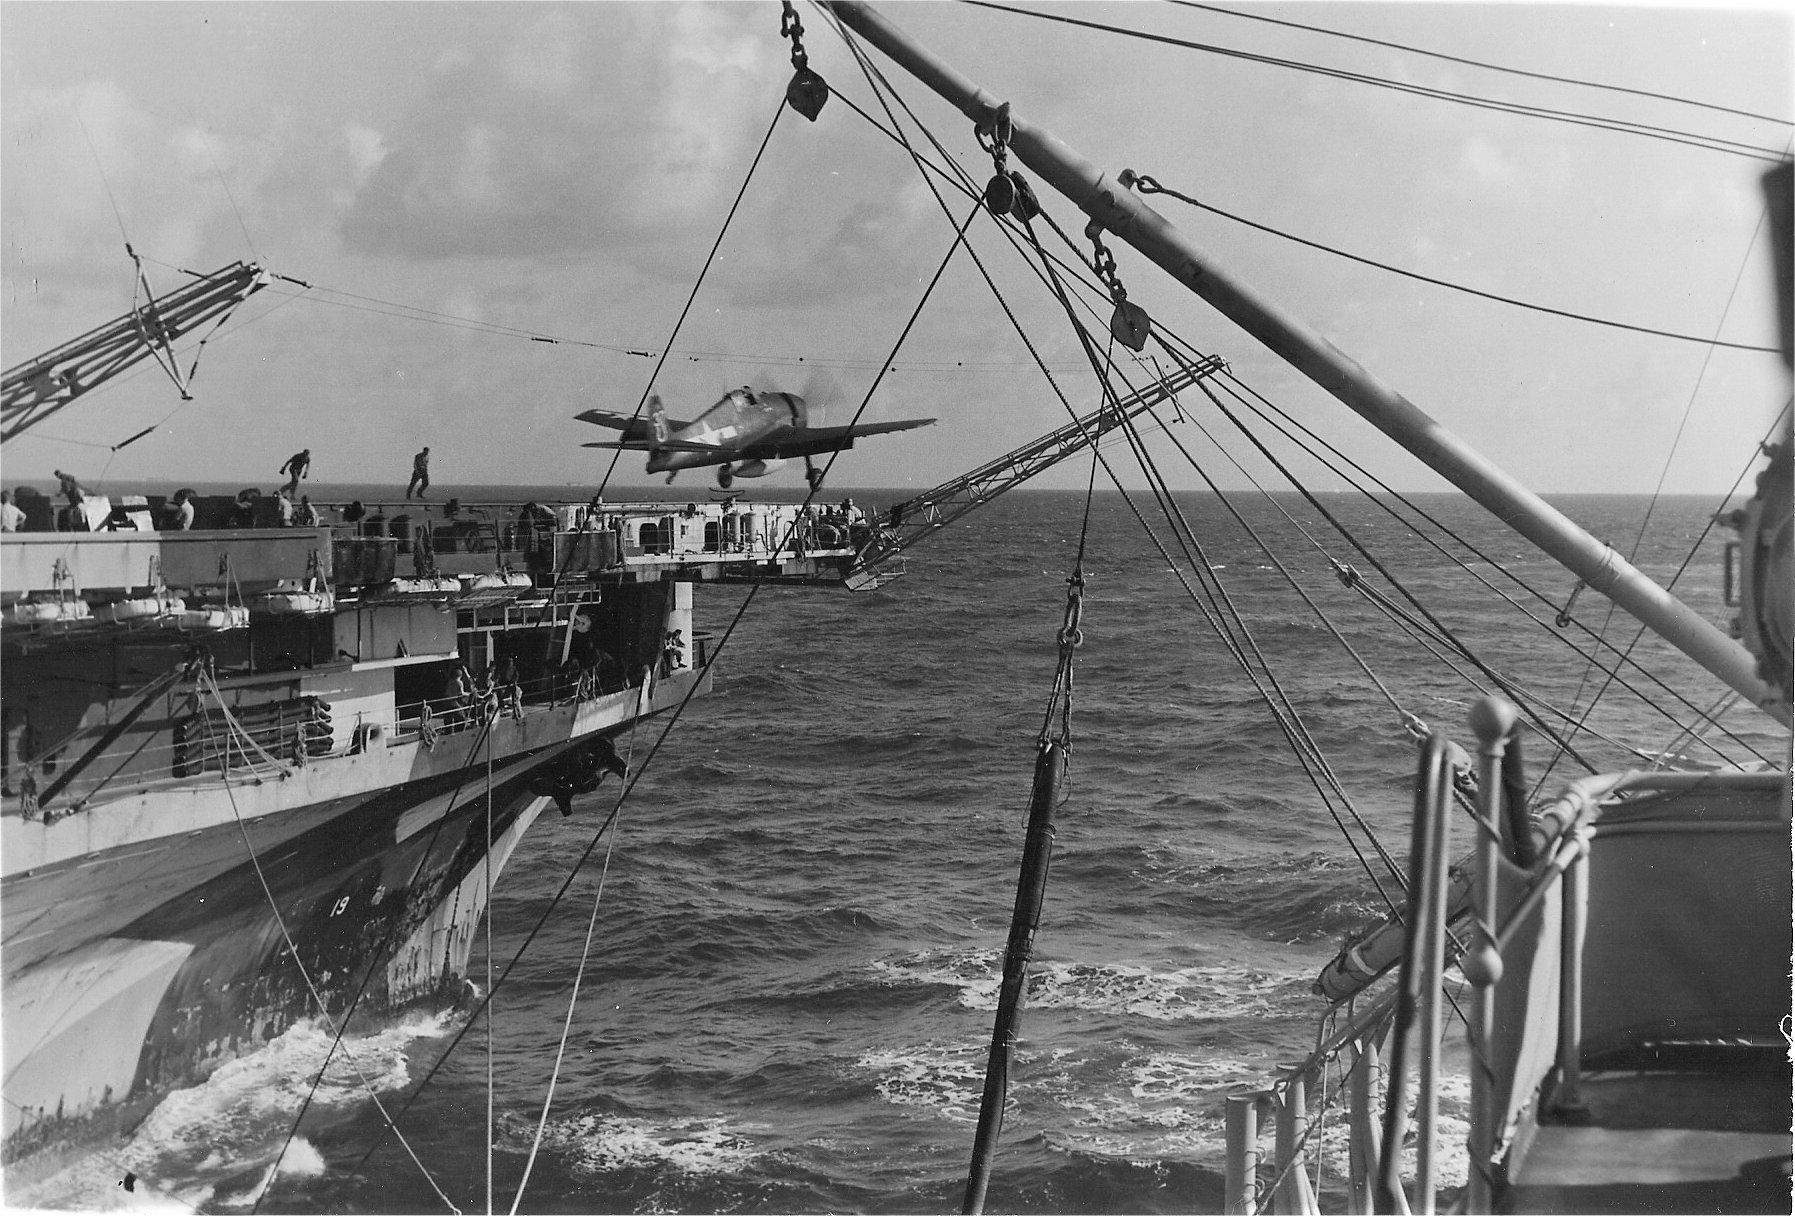 Grumman F6F 3 Hellcat VF 7 White 37 horseshoe launched from CV 19 USS Hancock 1944 01